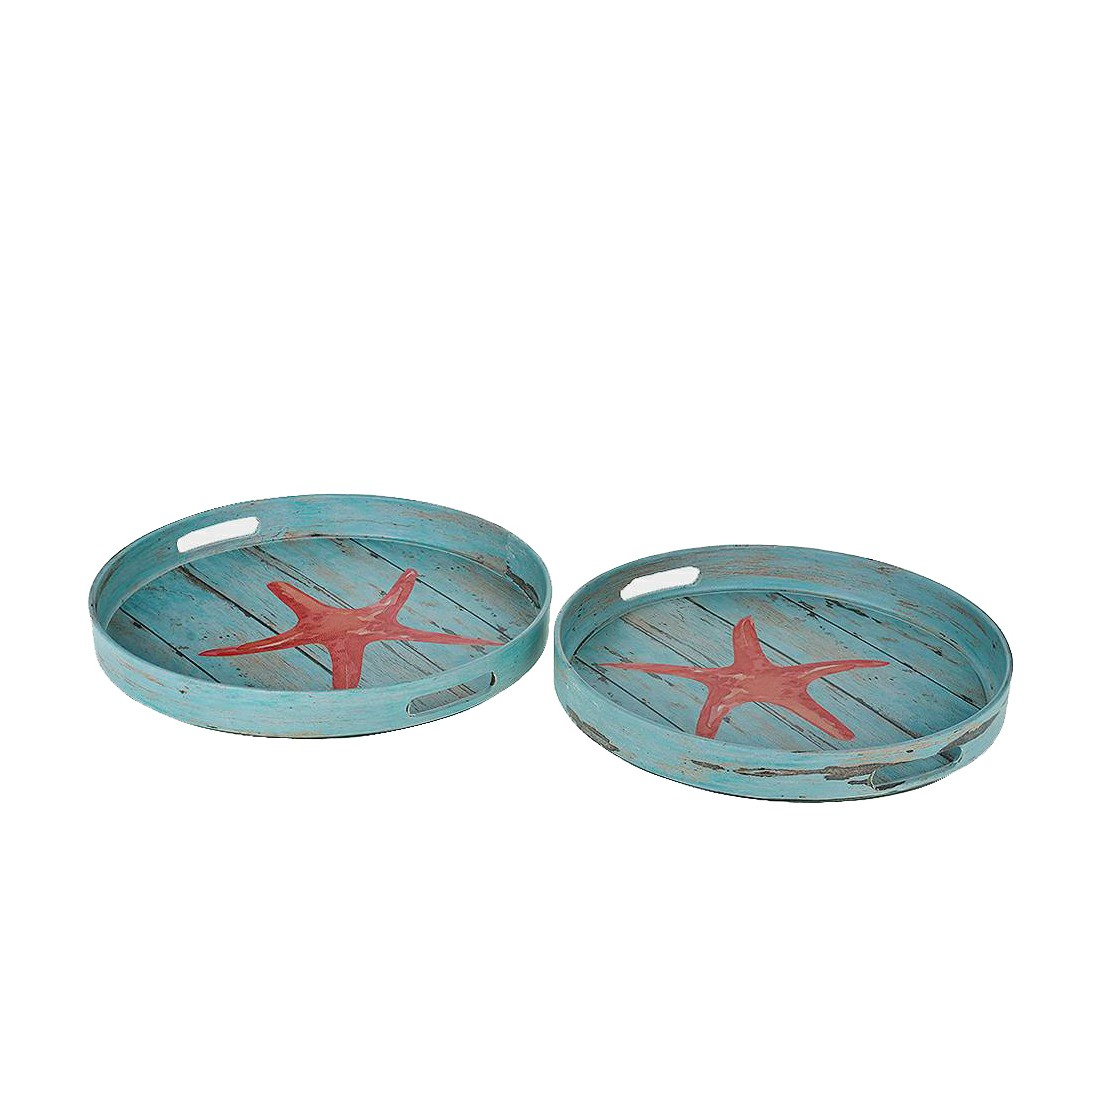 Bandeja Redonda de Plastico 35cm Azul Claro - GPresentes